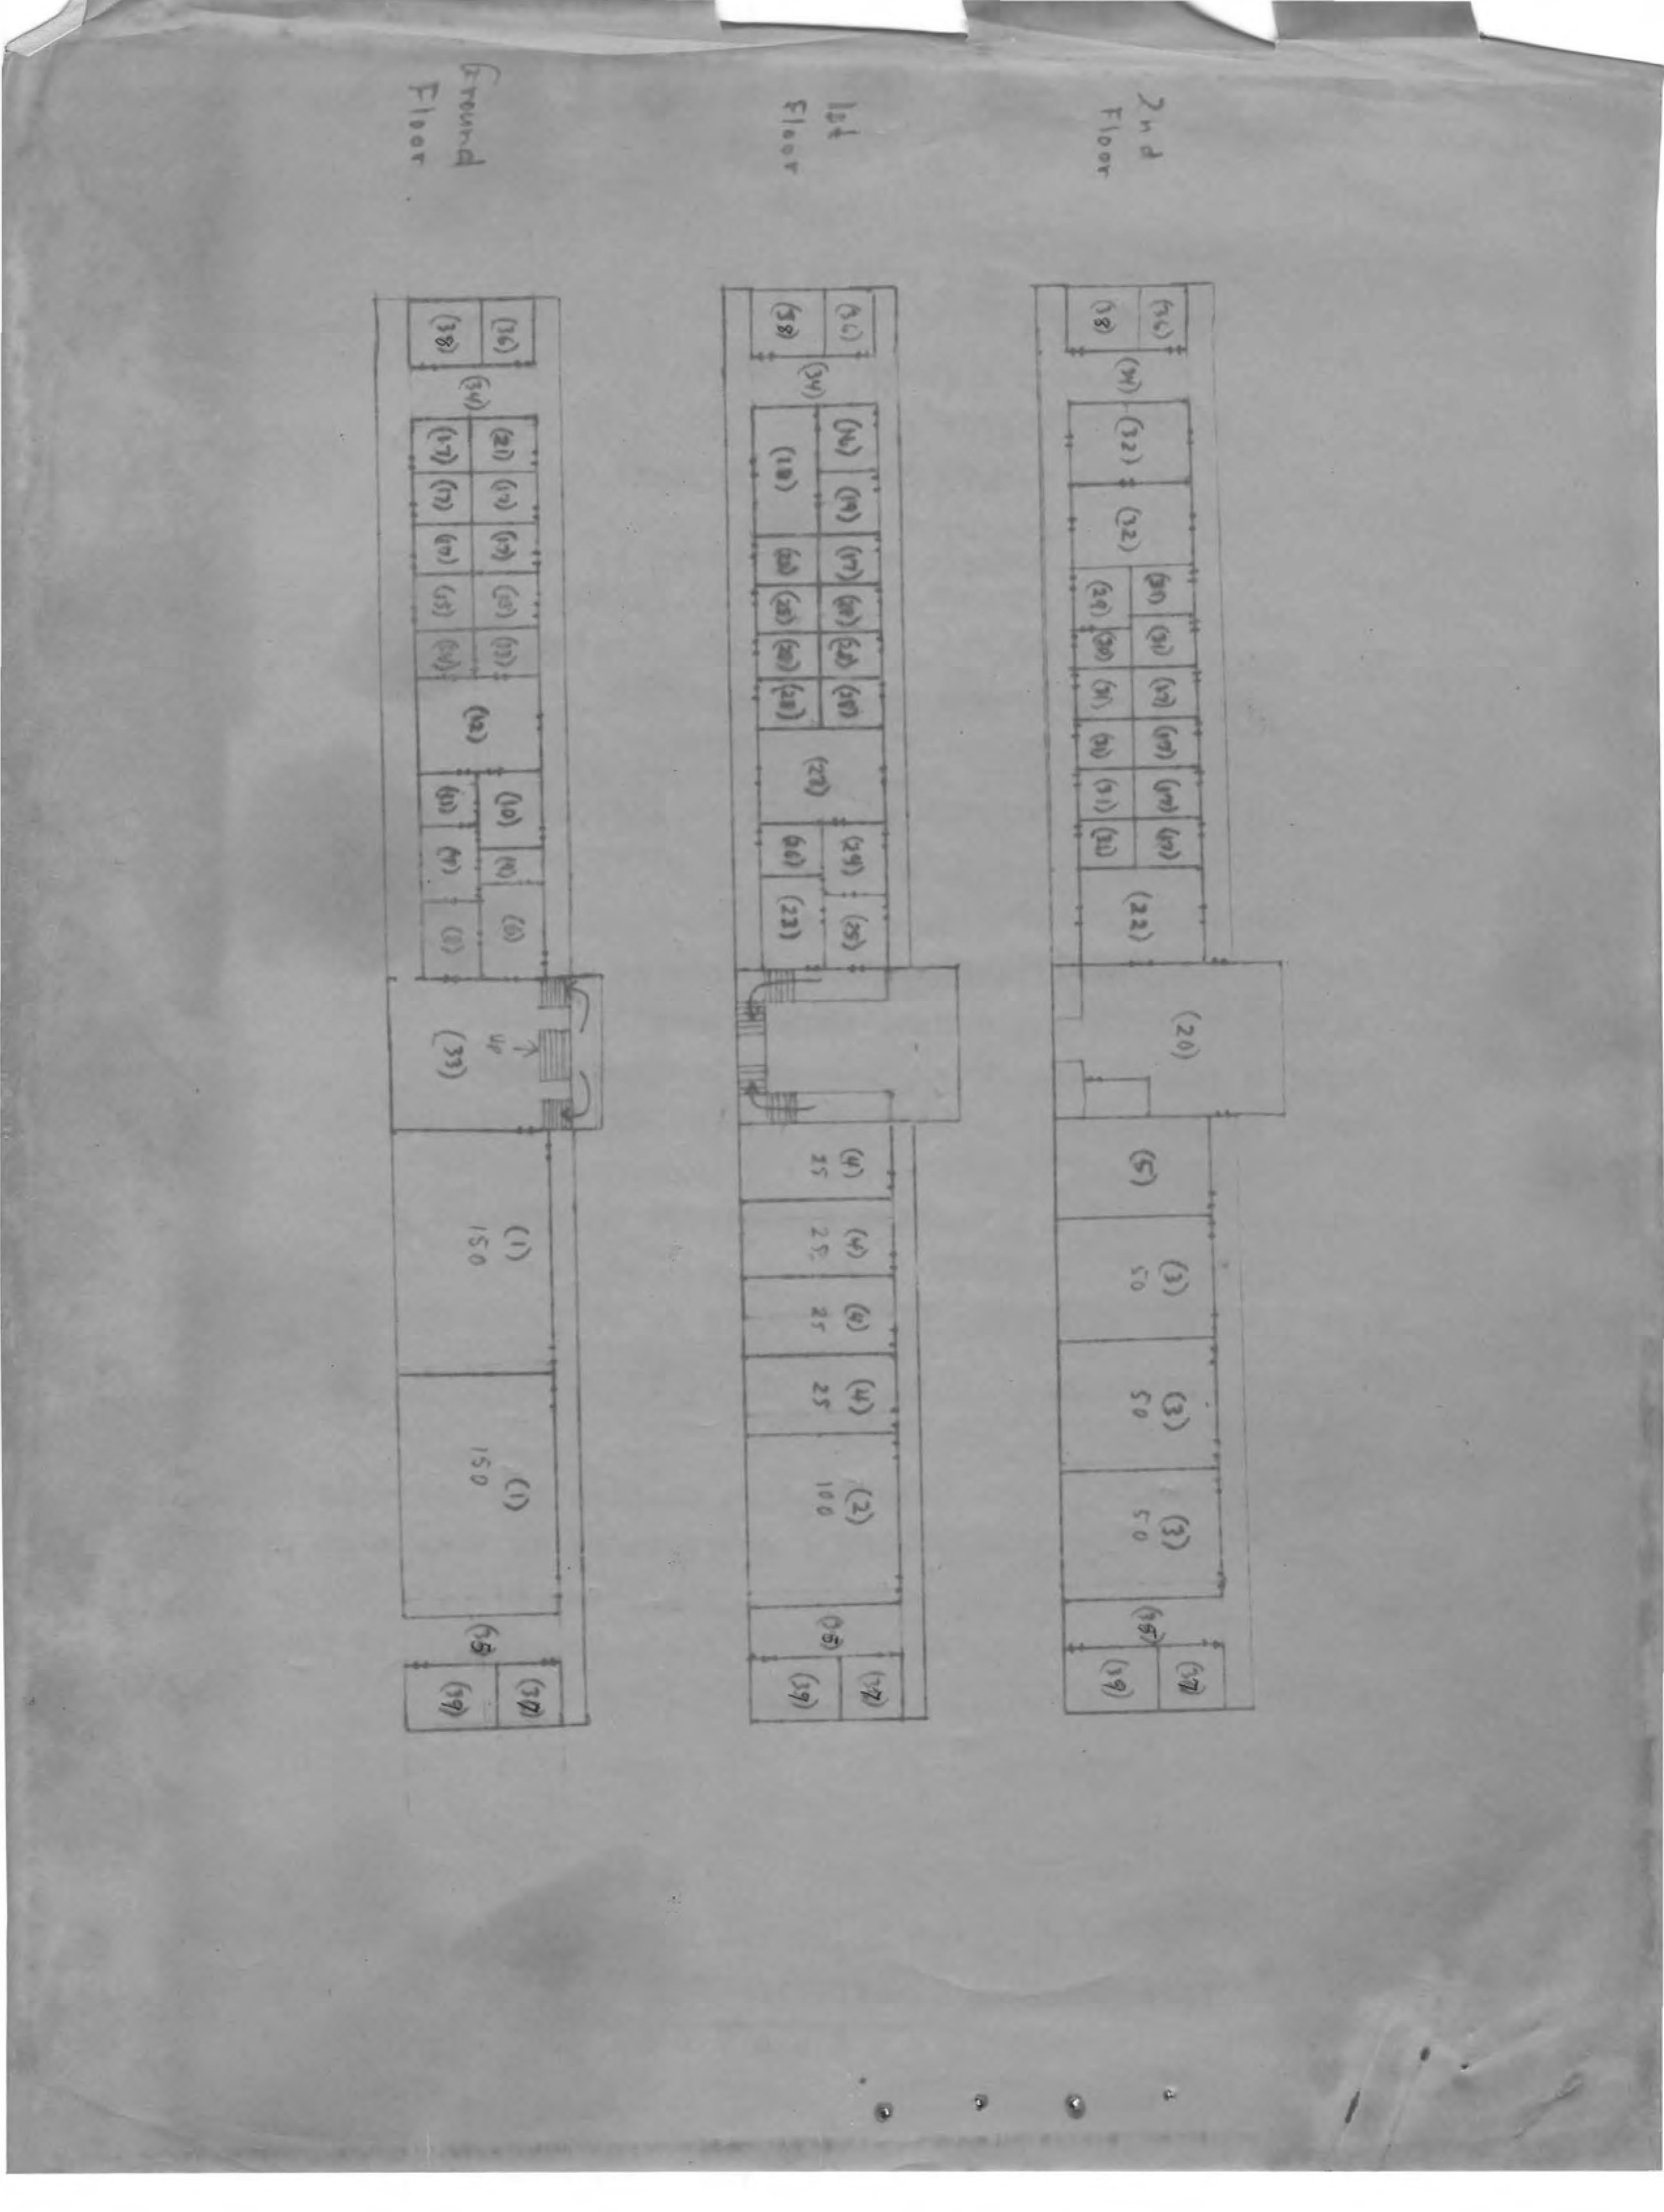 Construction, Blueprints, Preliminary, undated